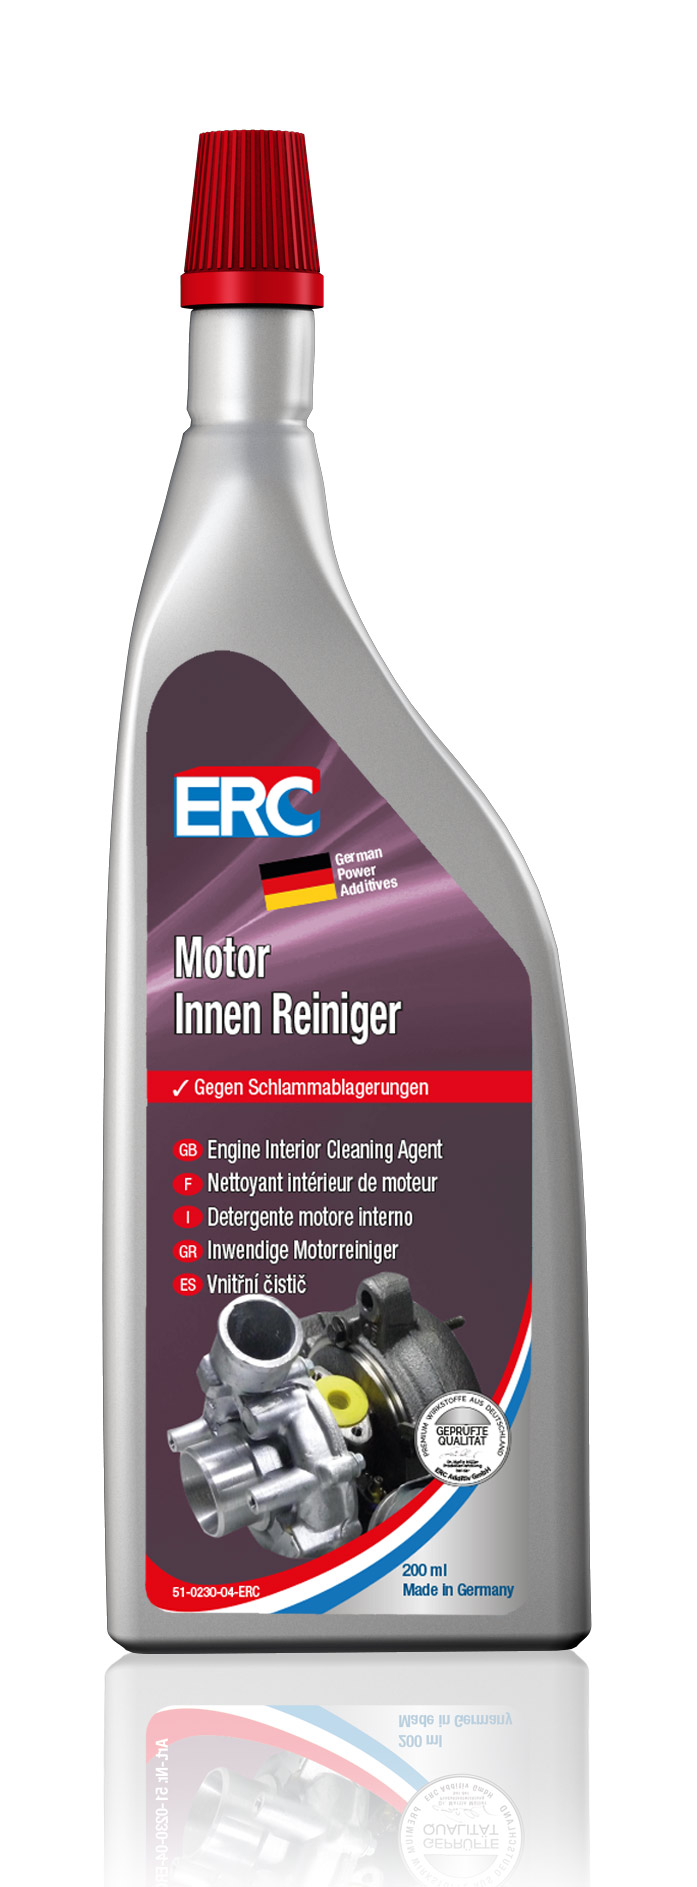 1 x 200 ml ERC Motorinnenreiniger Motor Innen Reiniger Innenreiniger Motorspülung